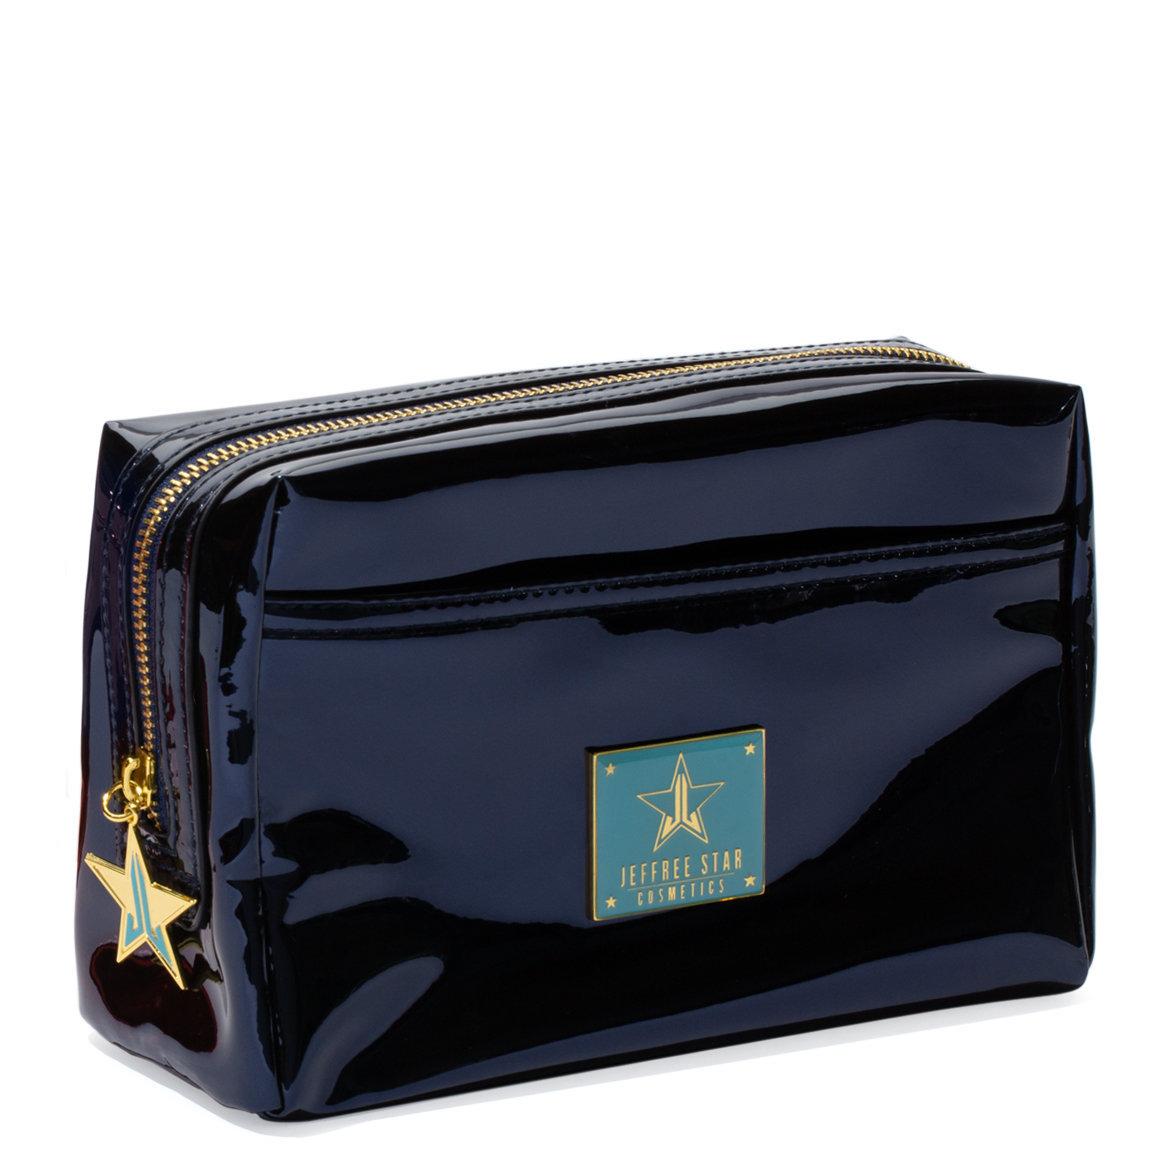 ecd01300cb477e Jeffree Star Cosmetics Makeup Bag Reflective Dark Blue product smear.